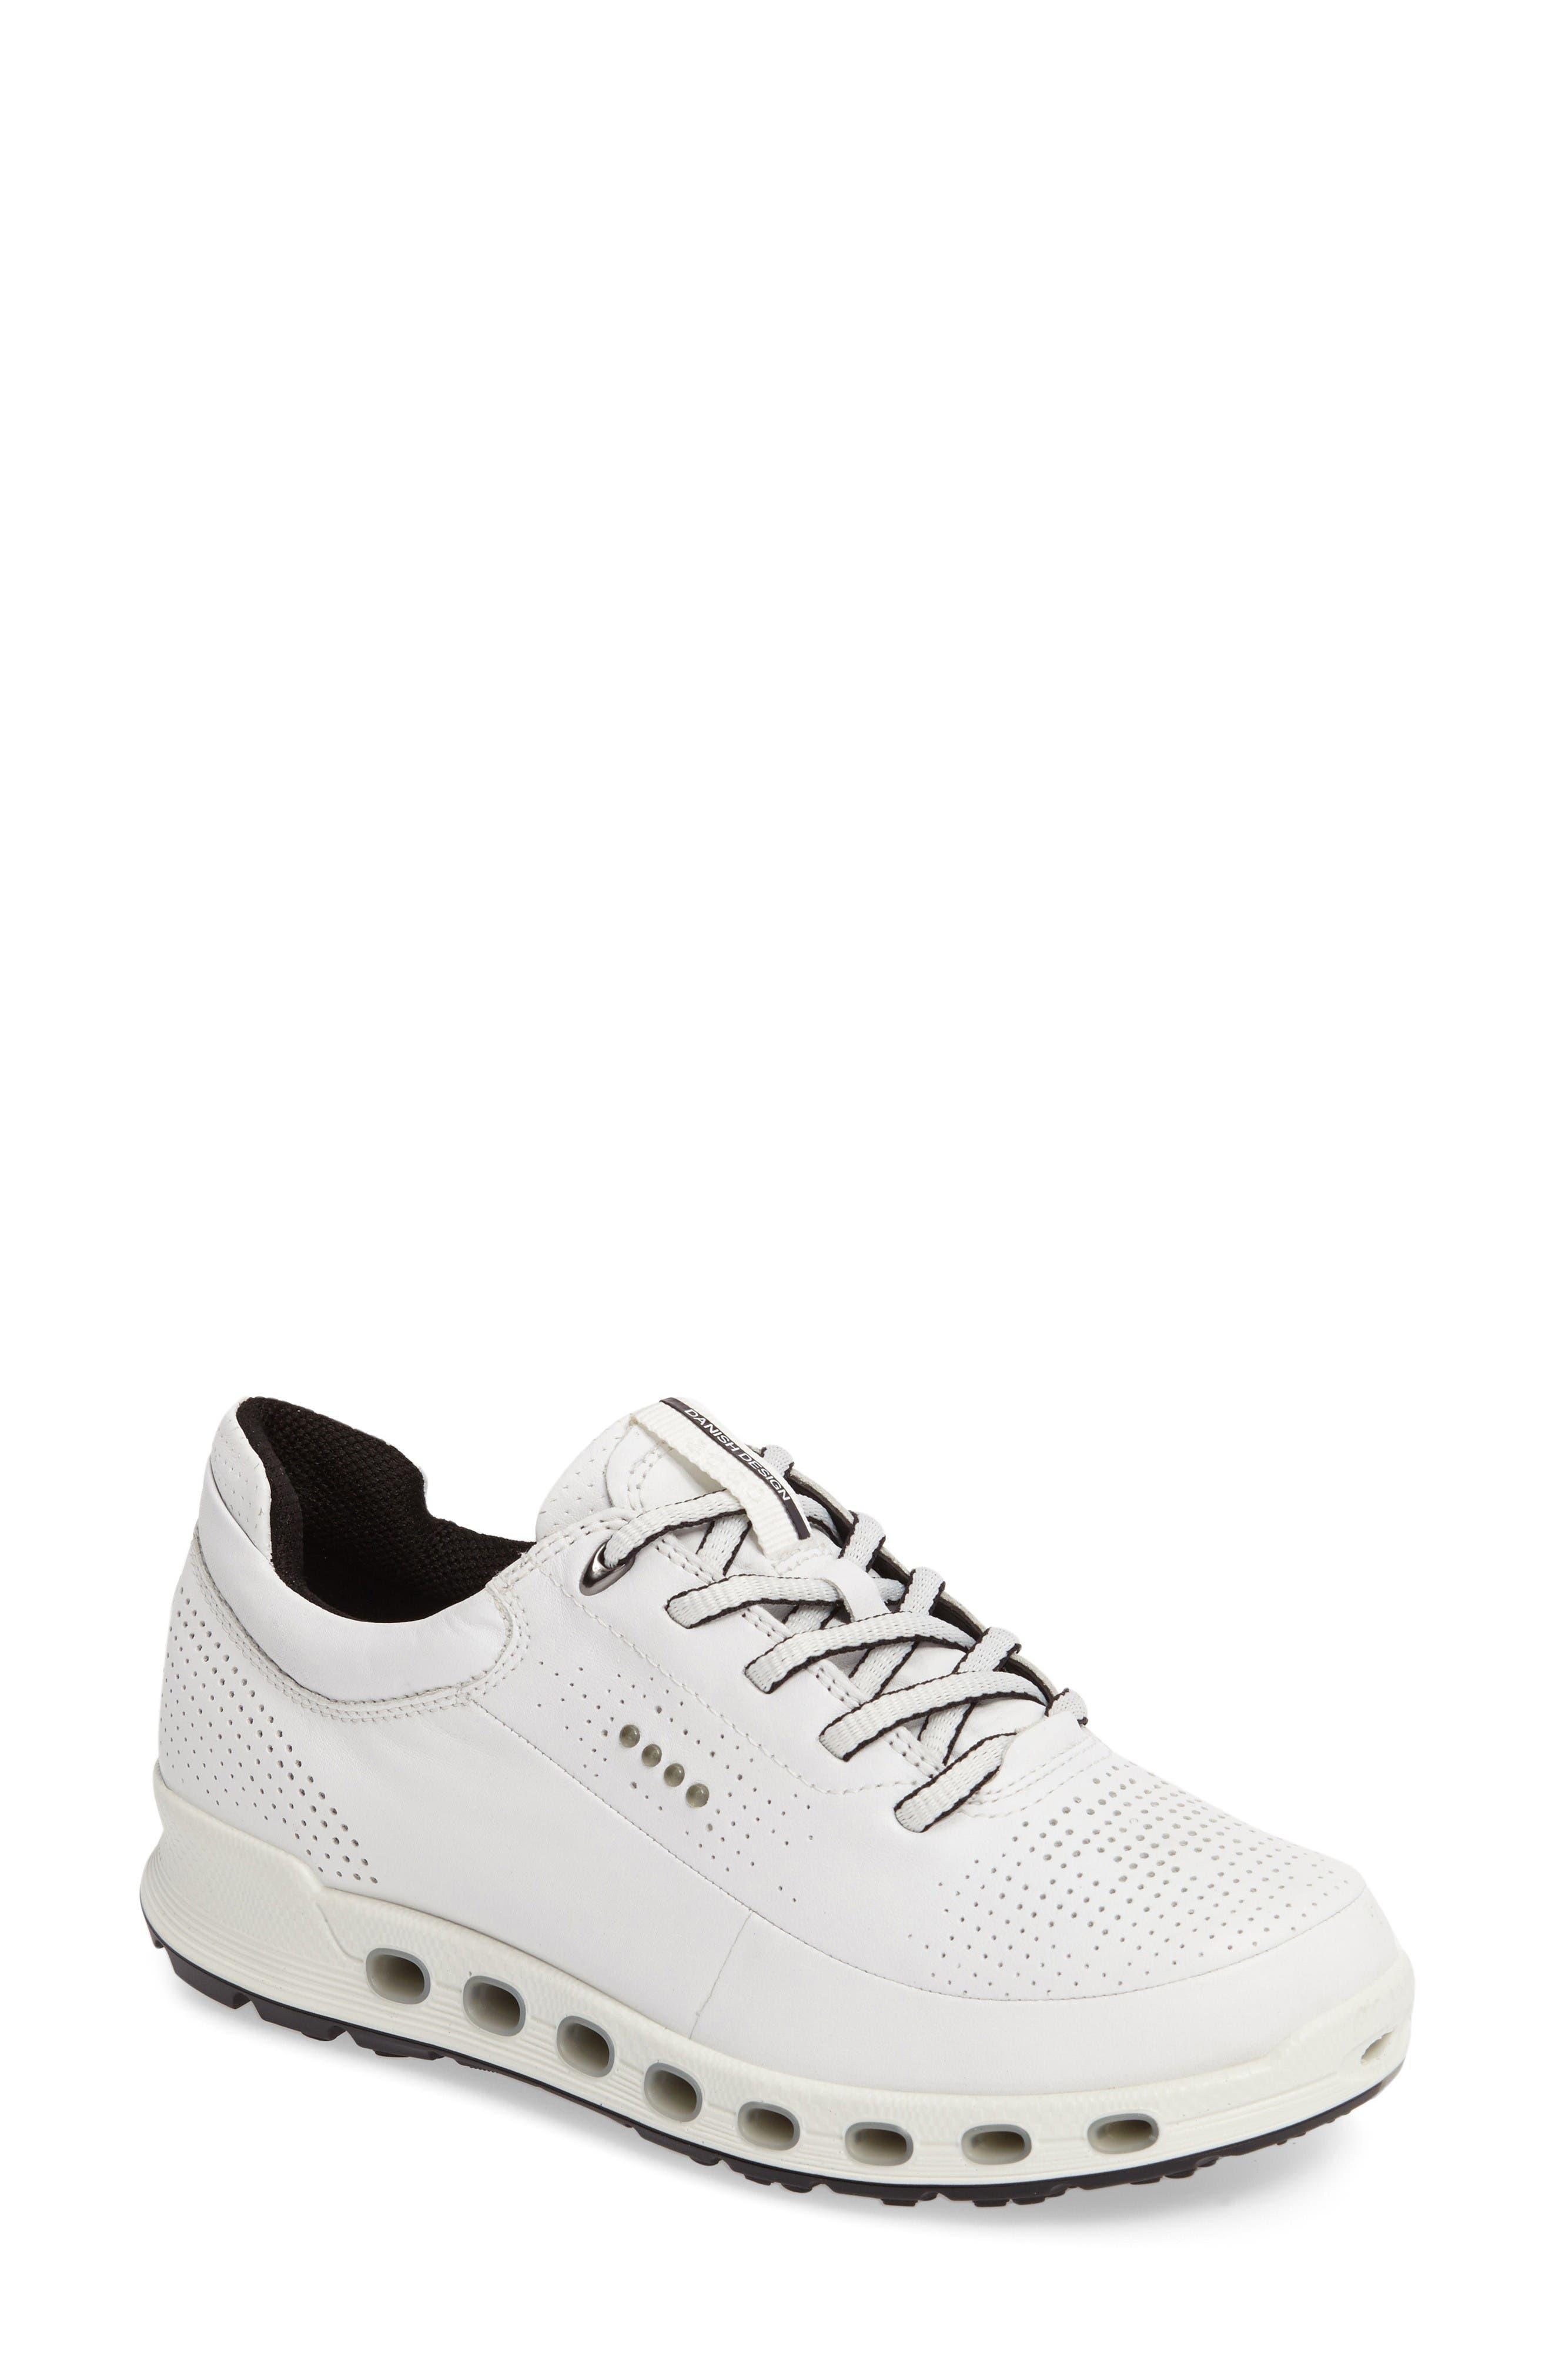 ECCO Cool 2.0 GTX Waterproof Sneaker